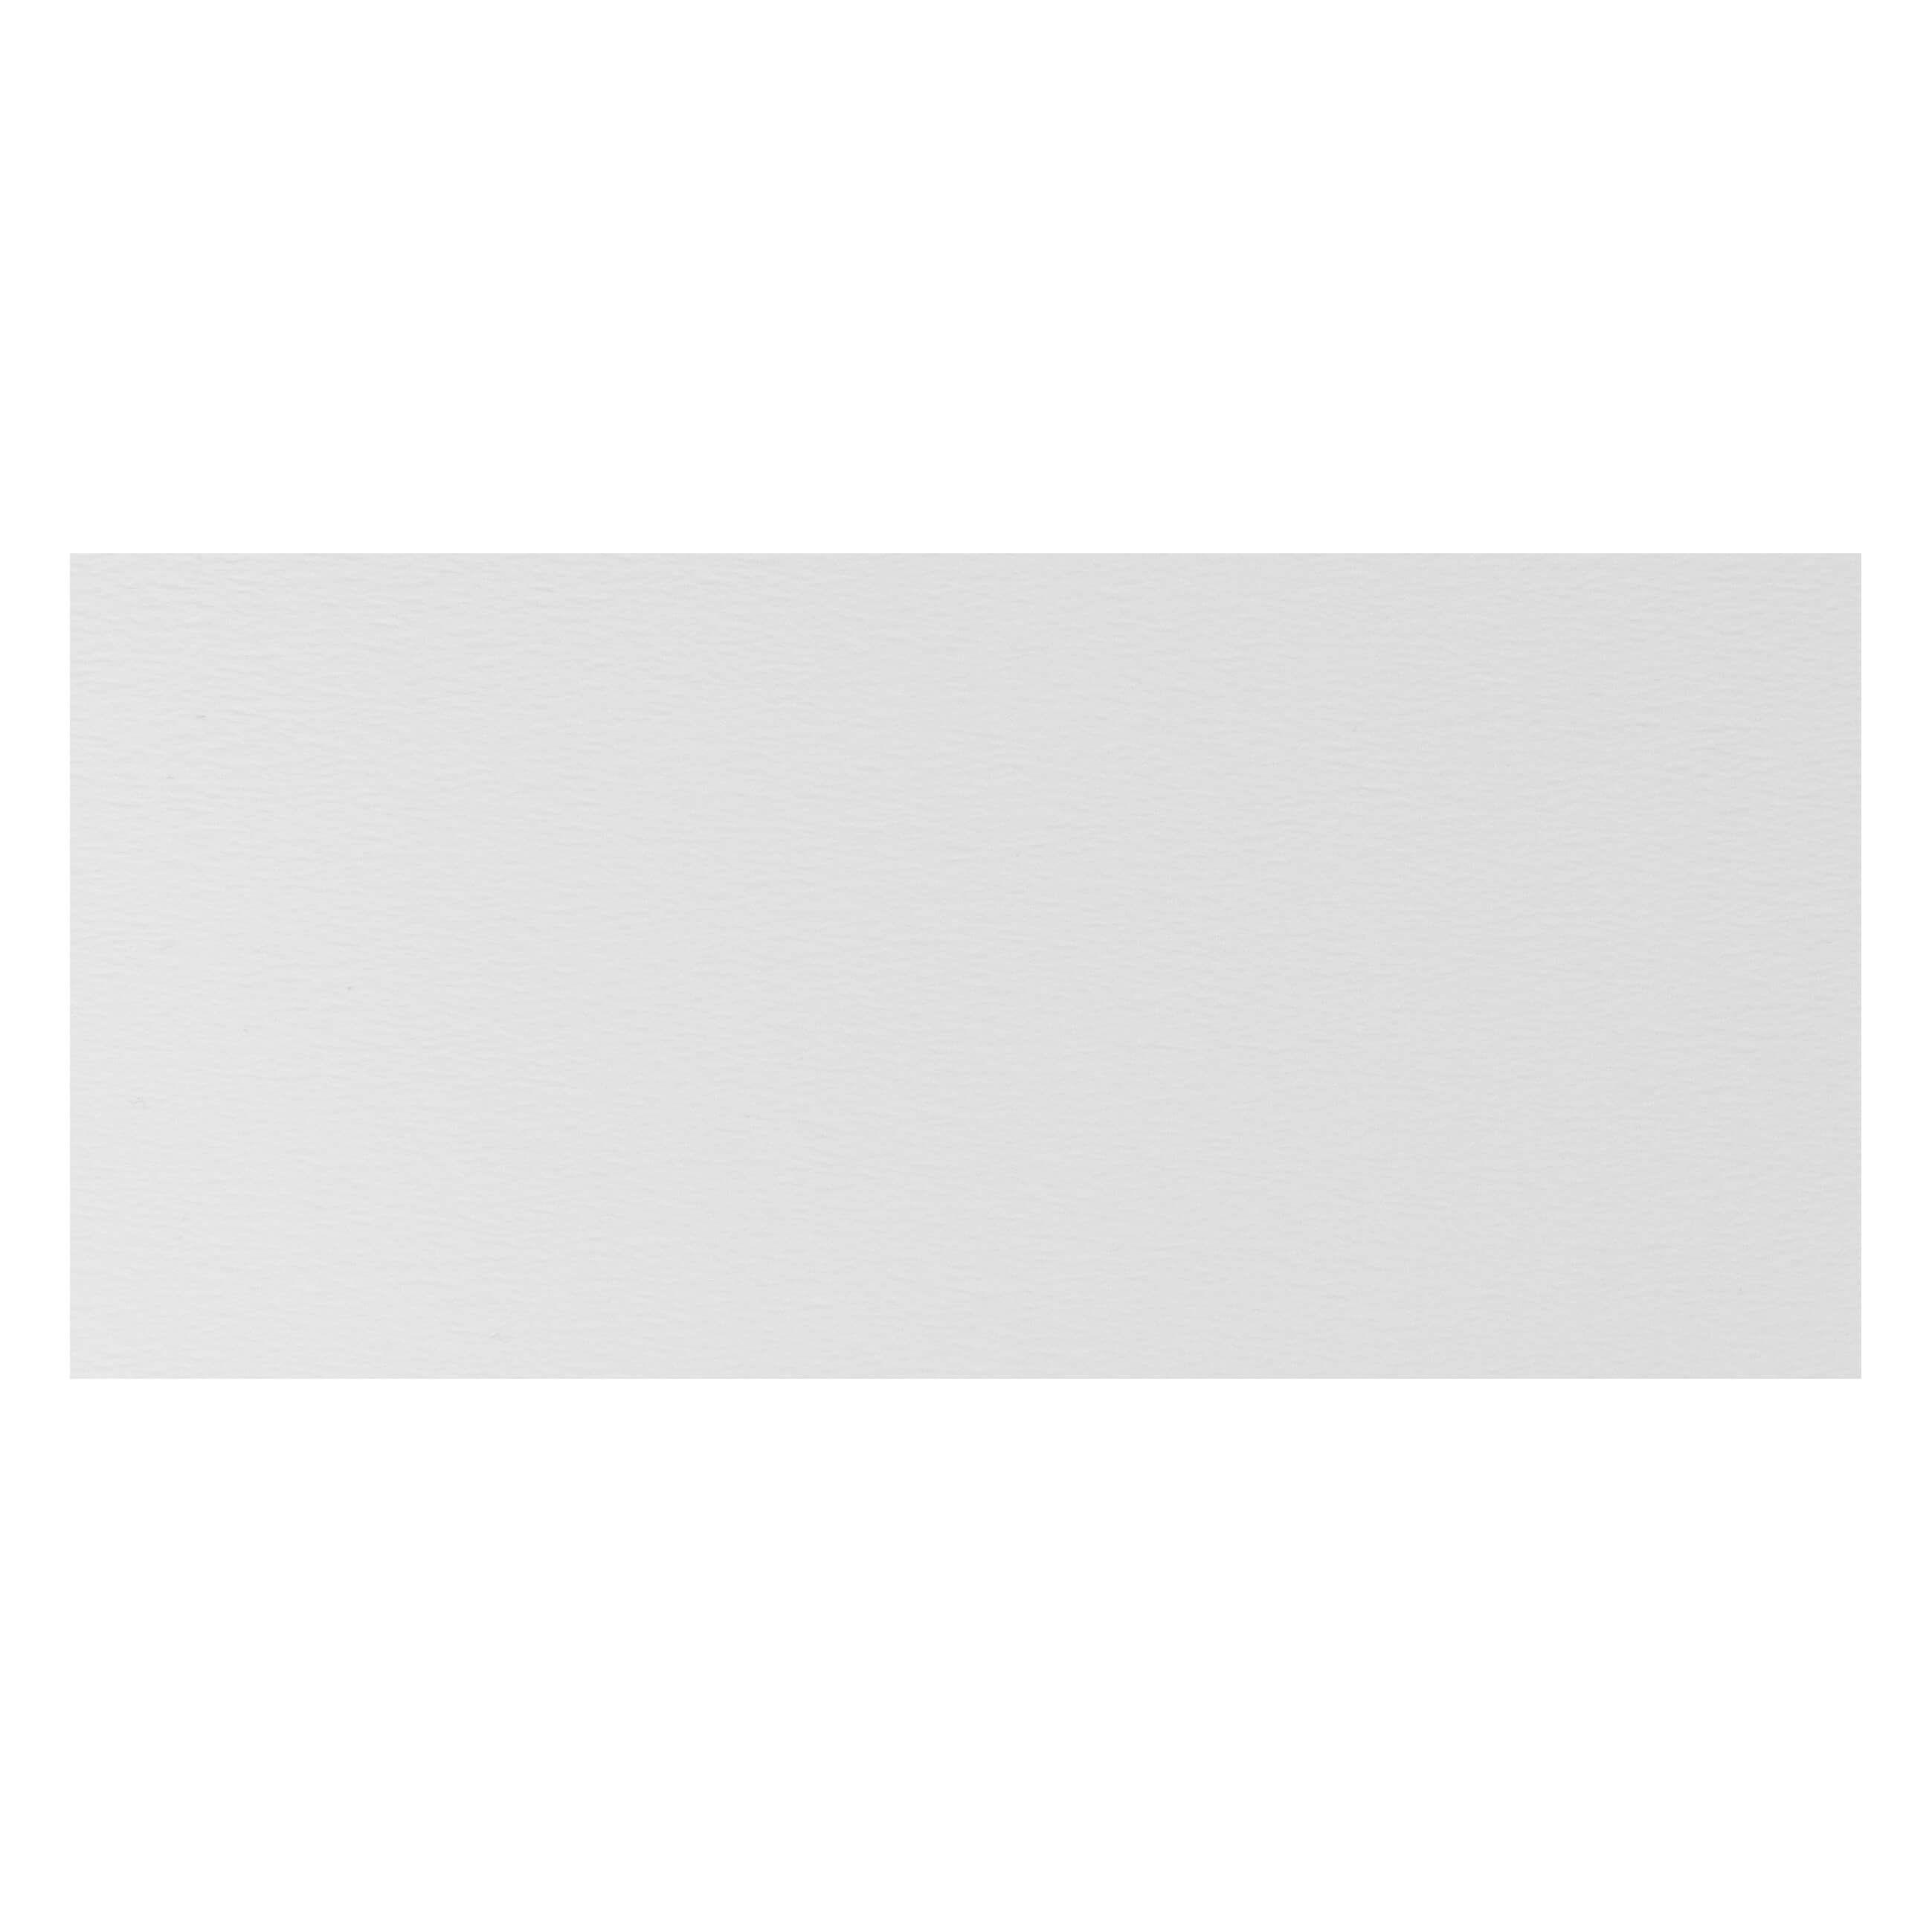 Cardstock DL Top - Antique White